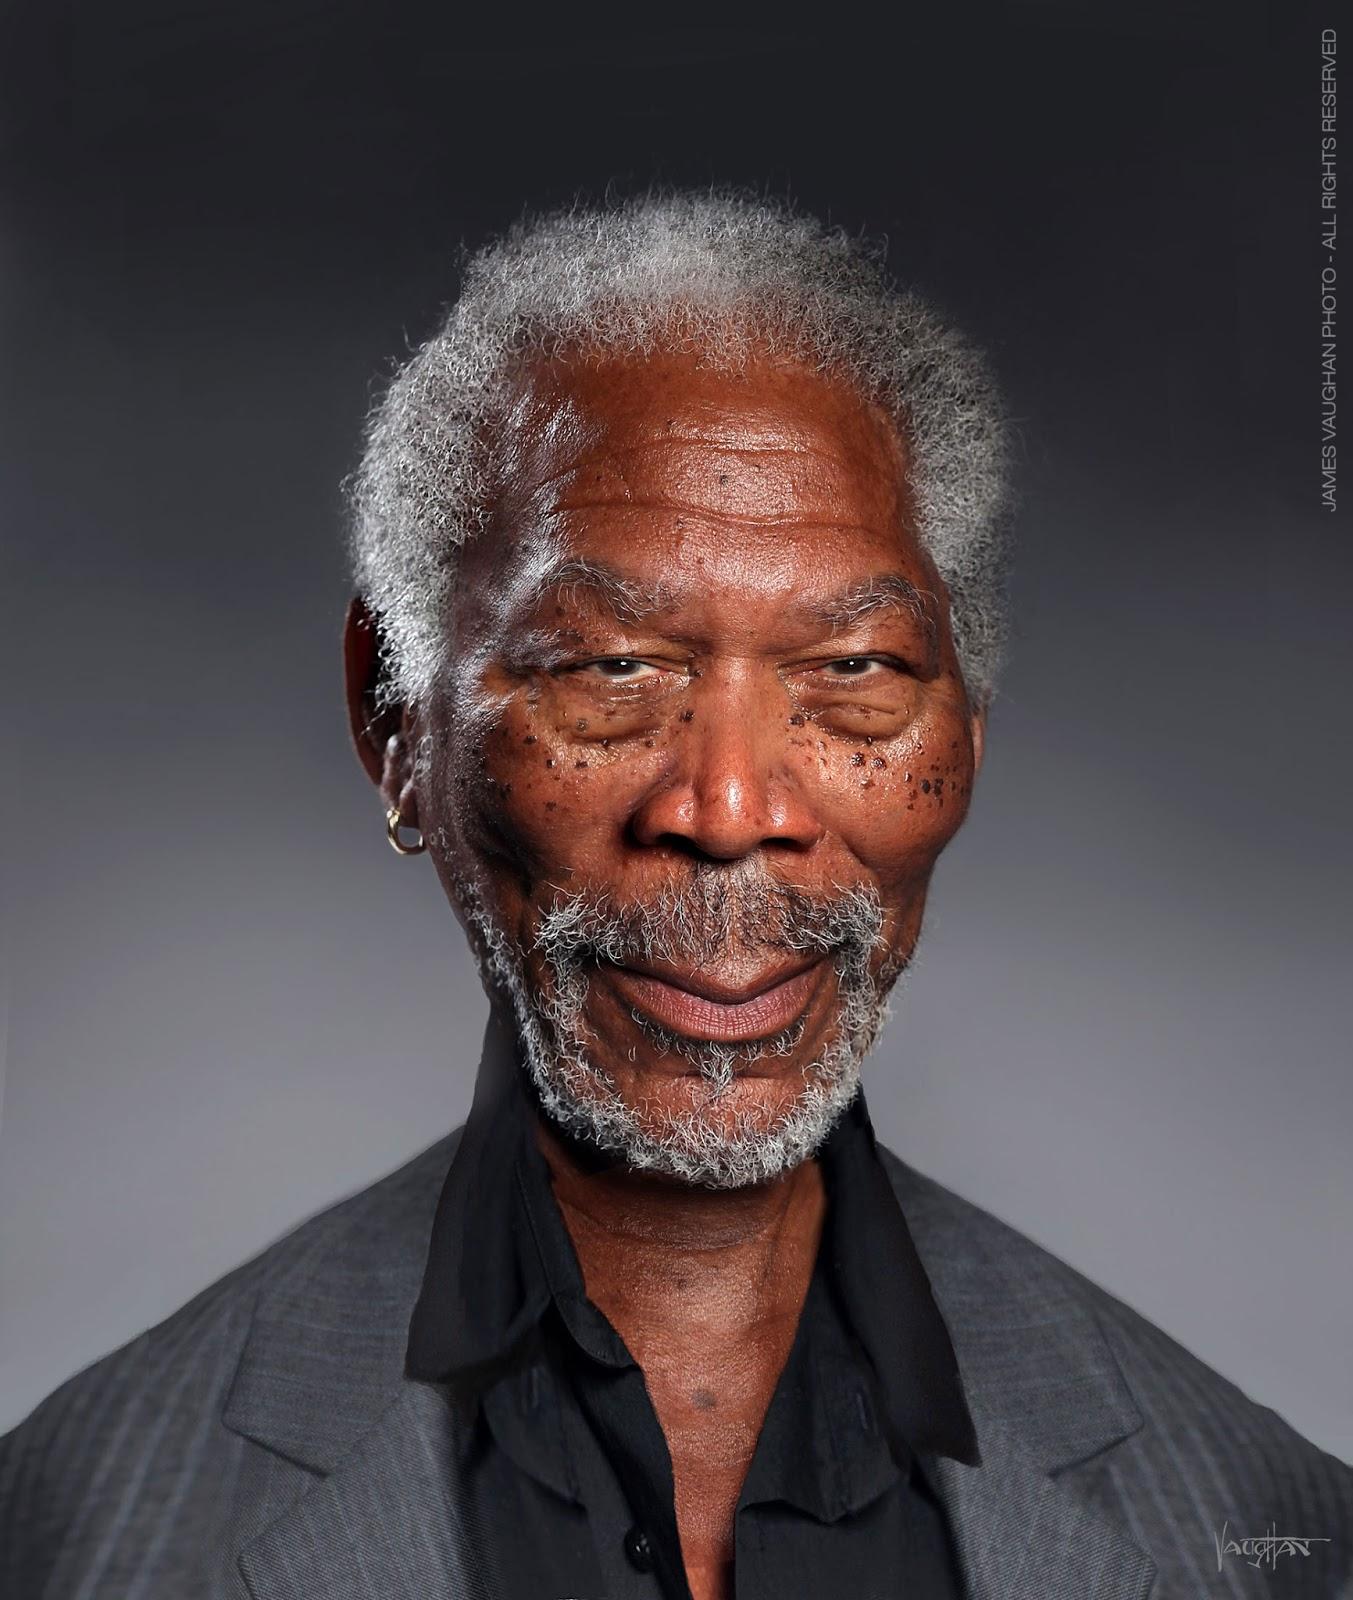 Morgan Freeman 2018 worth – CountryBaptist